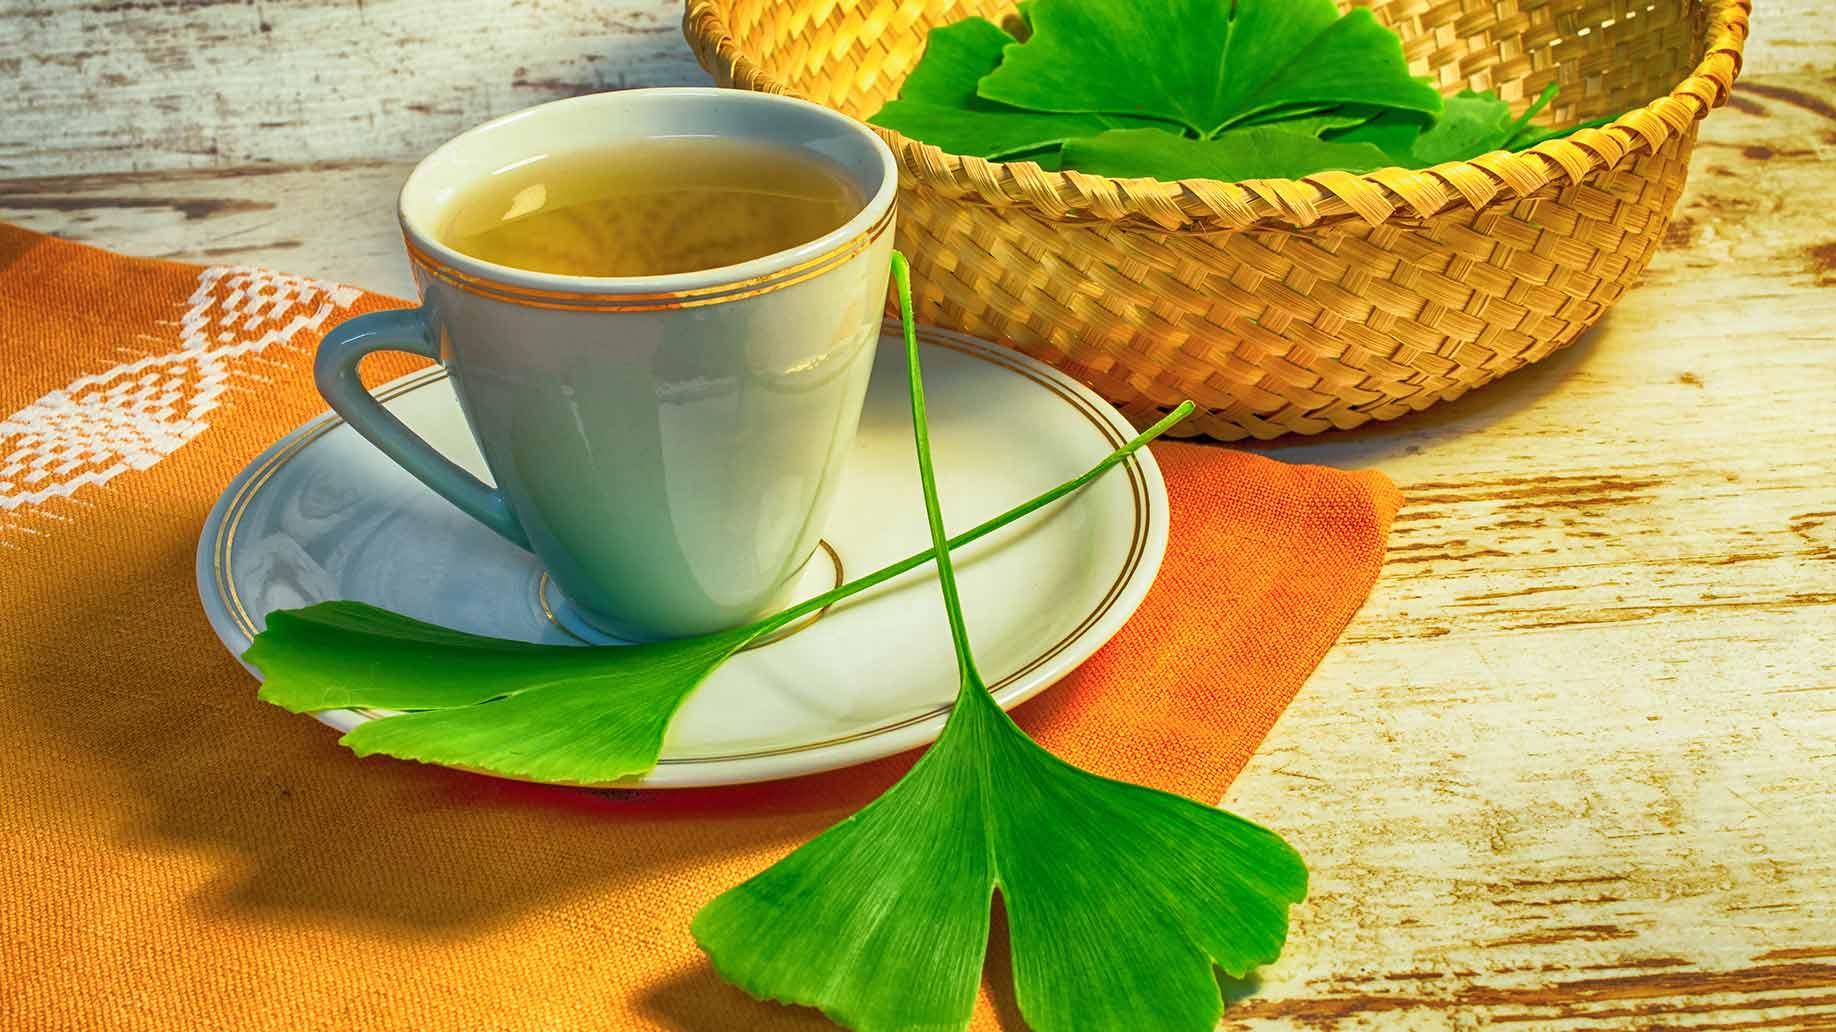 Leaky gut ginkgo biloba green leaves tea natural remedies